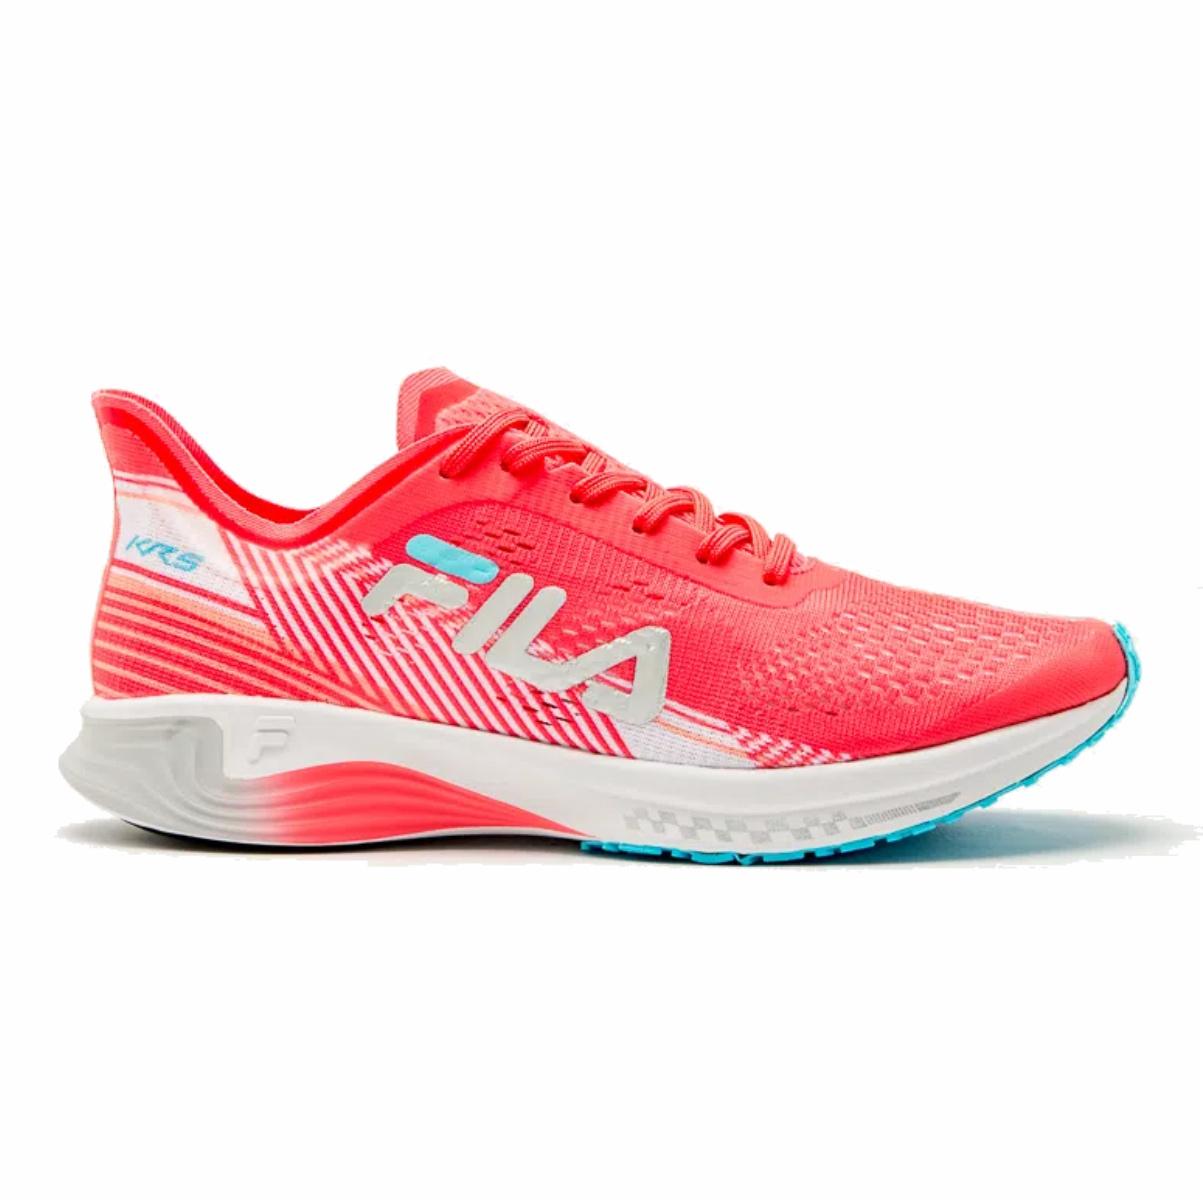 Tenis Fila KR5 Feminino Kenya Racer Running Performance